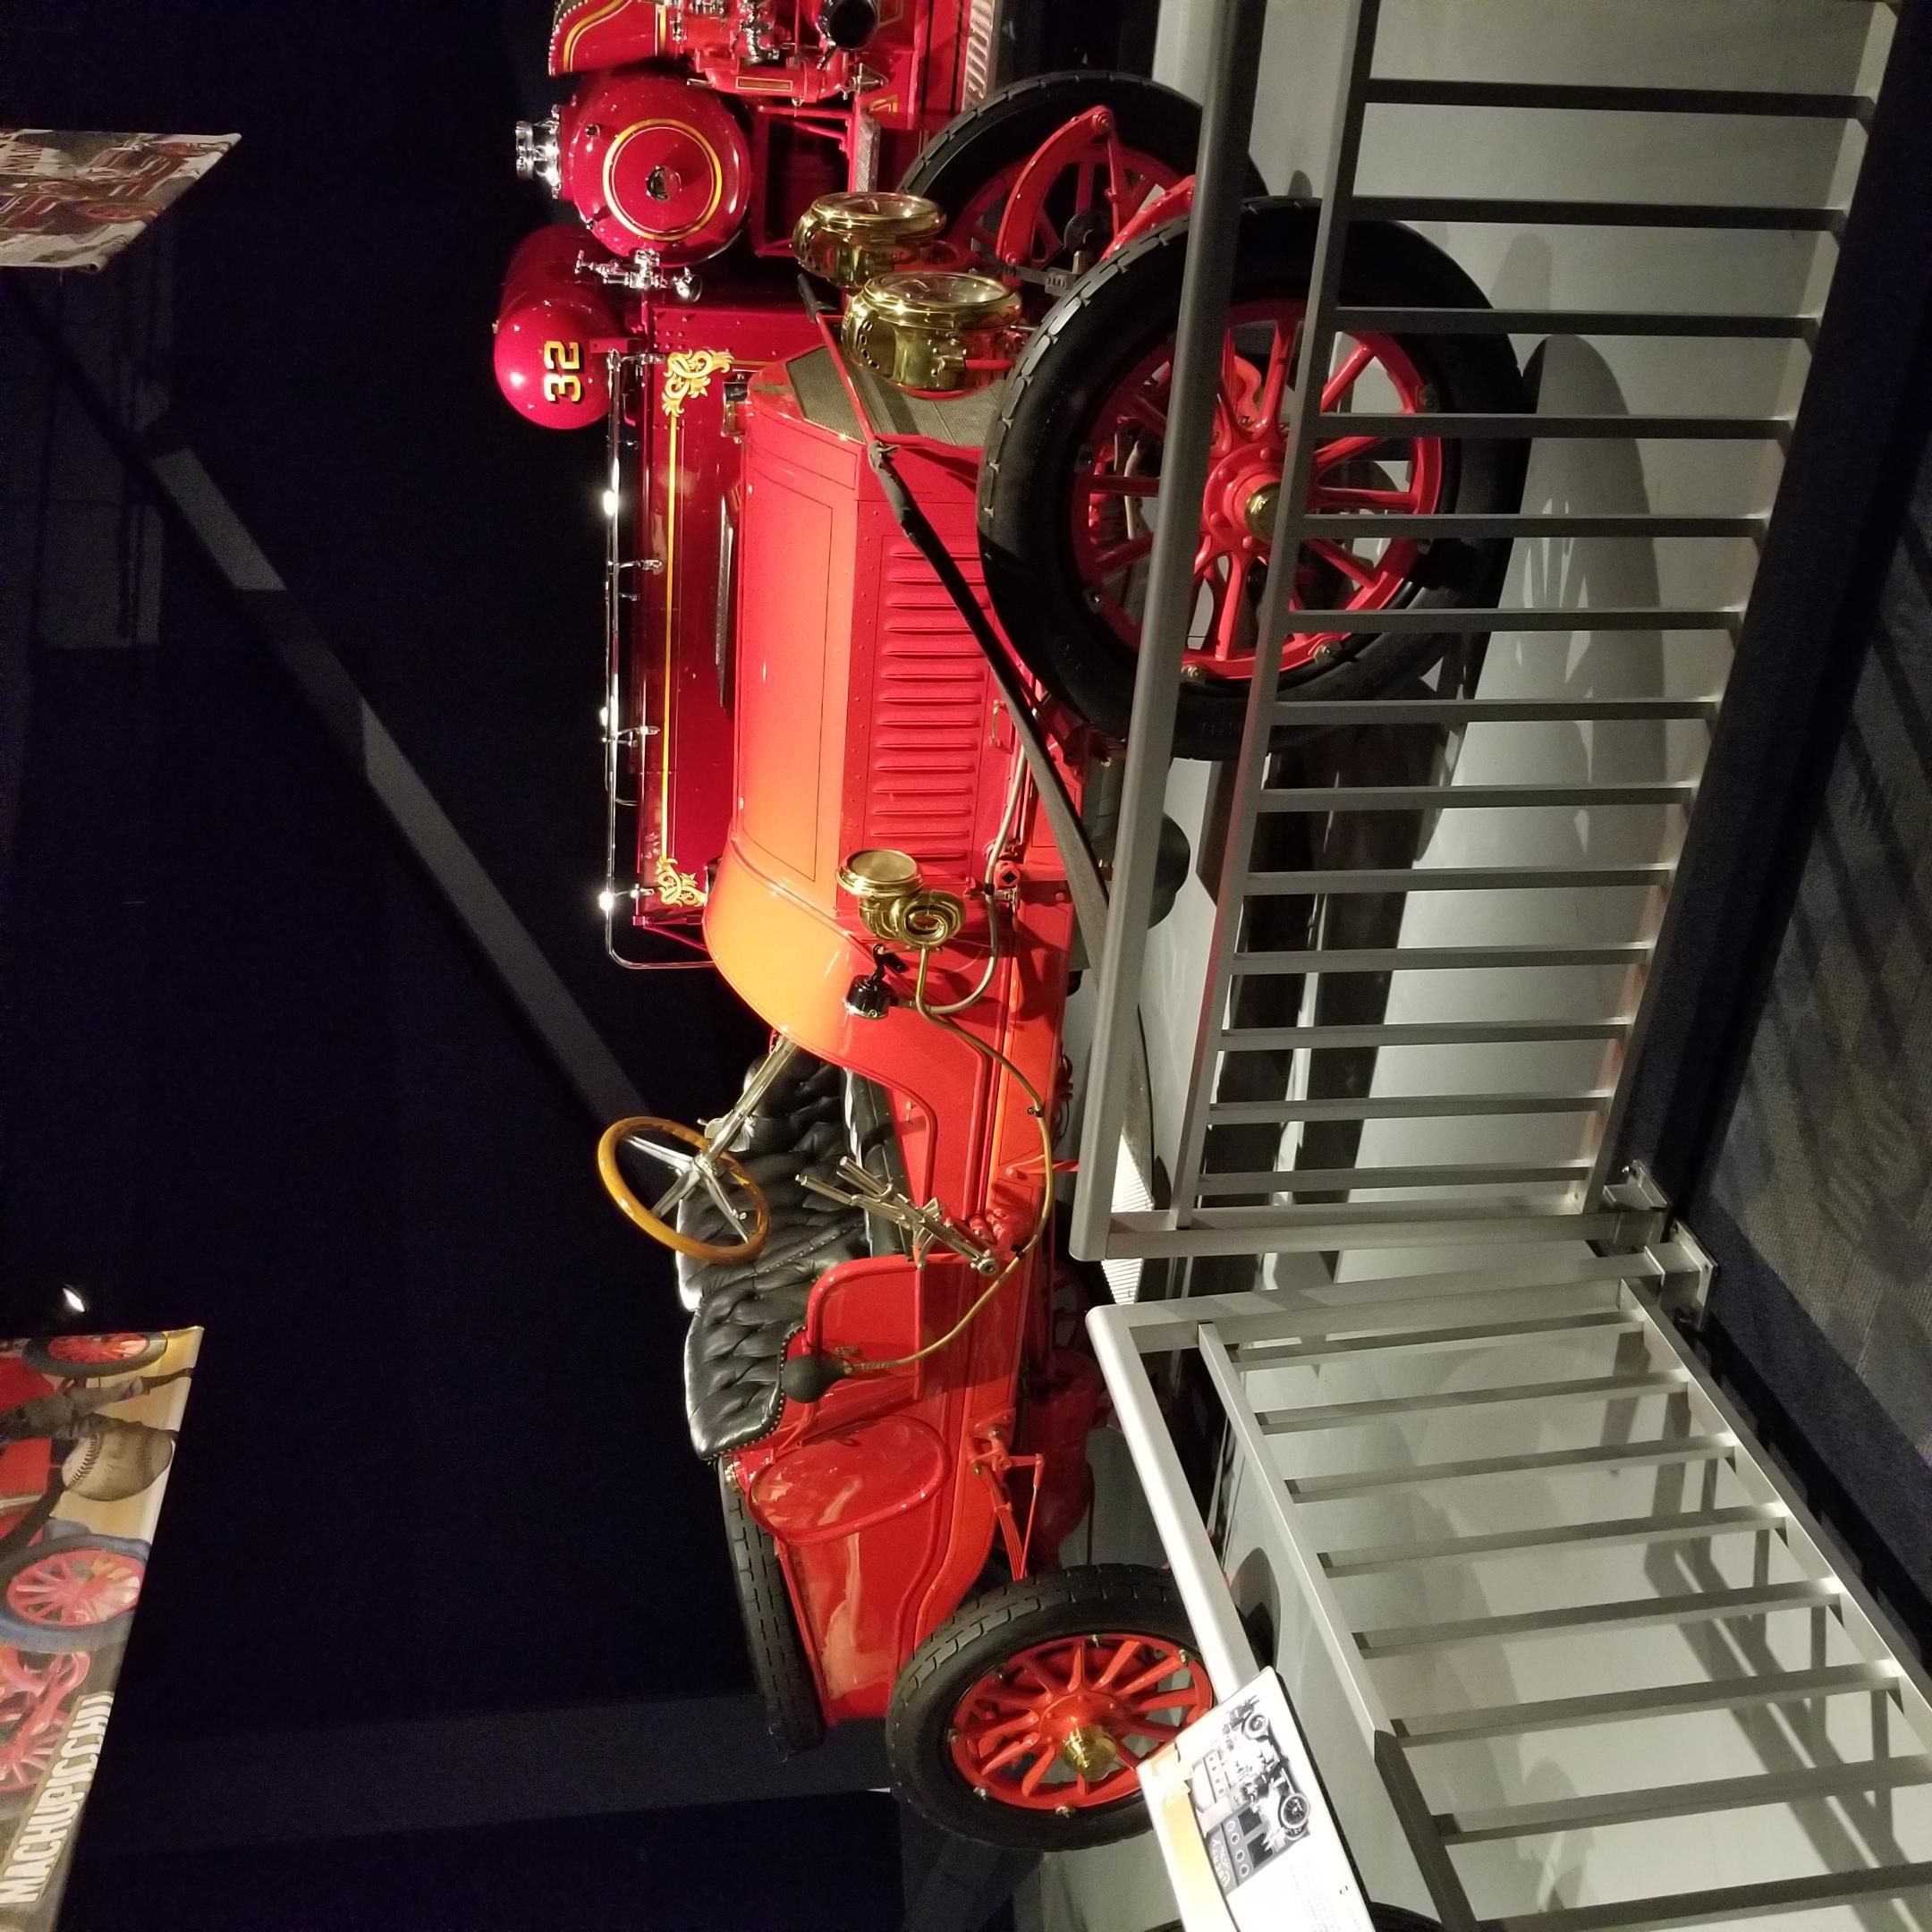 Fire Trucks from 1911-20190406_103023.jpg